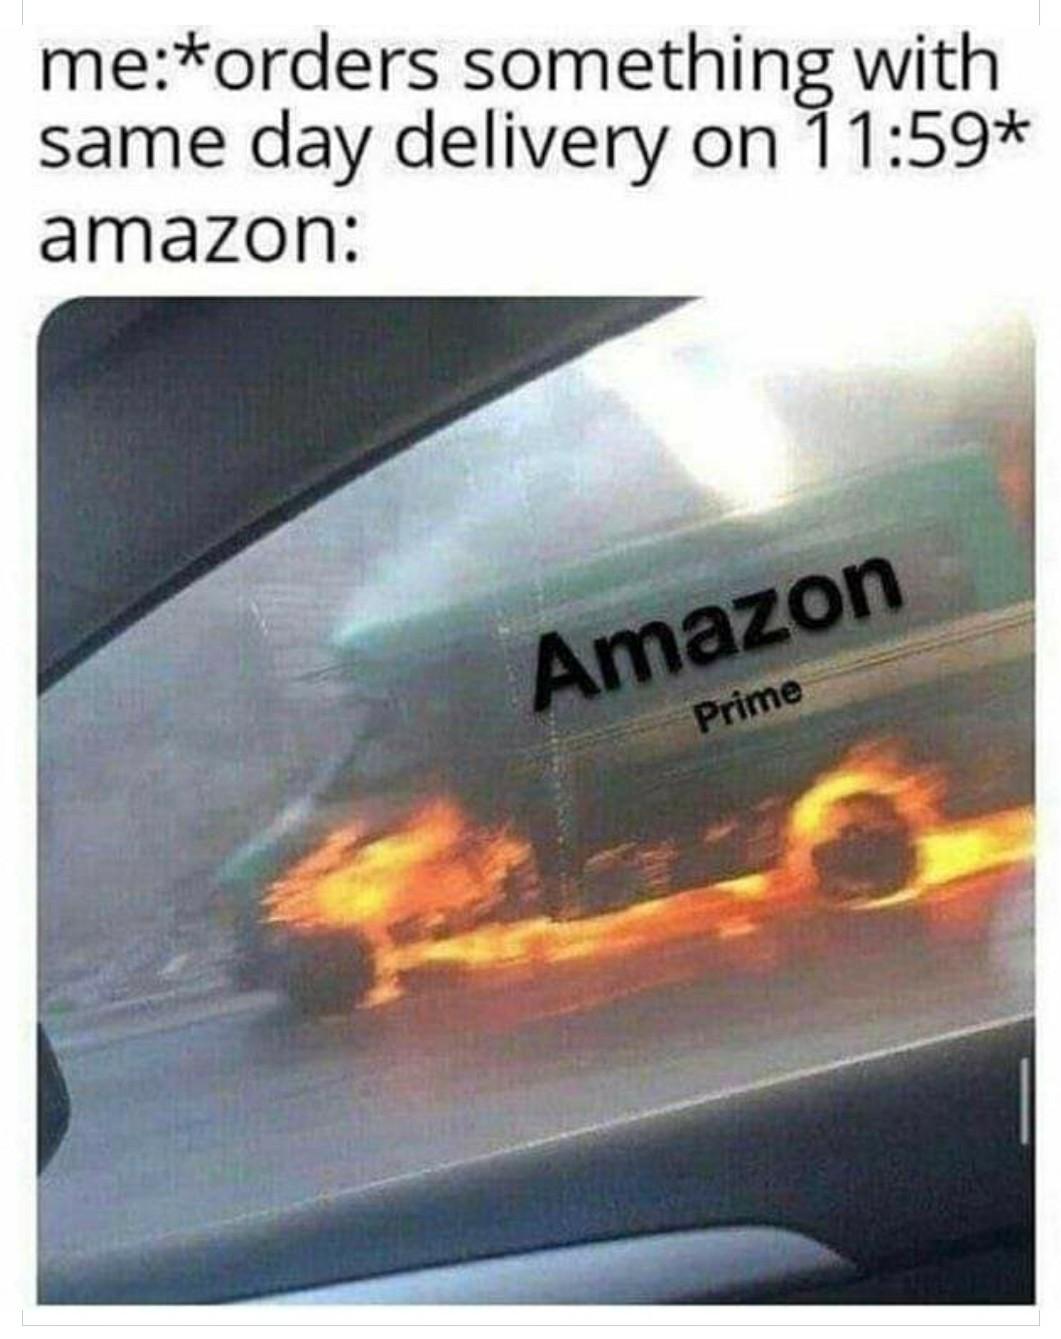 Comin in hot - meme